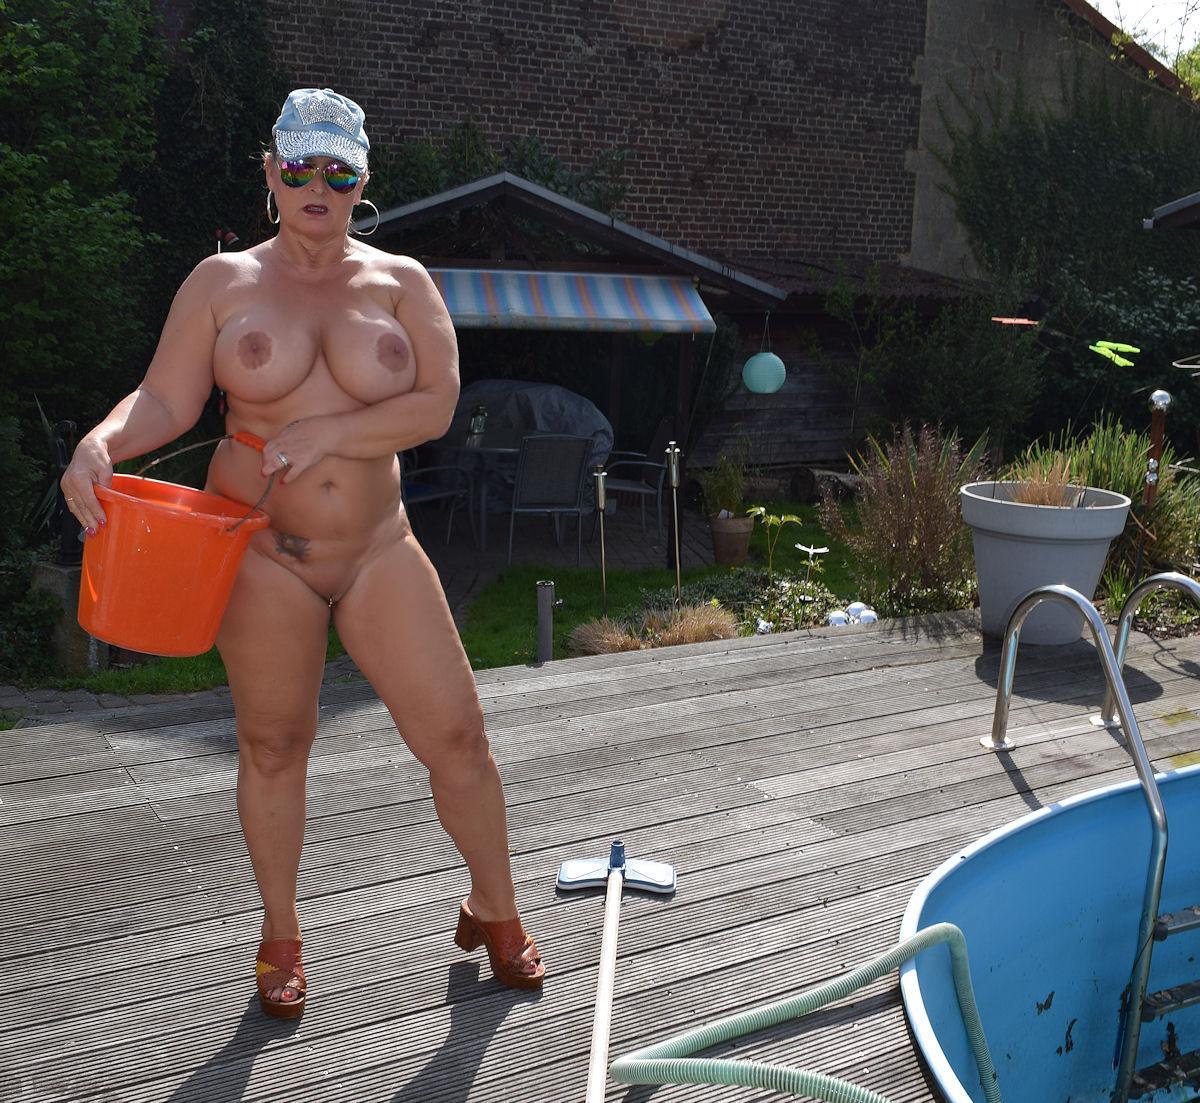 Cleaning my pool. So the nudist-season in my nudist-garden will start. 32n4qVYFHM